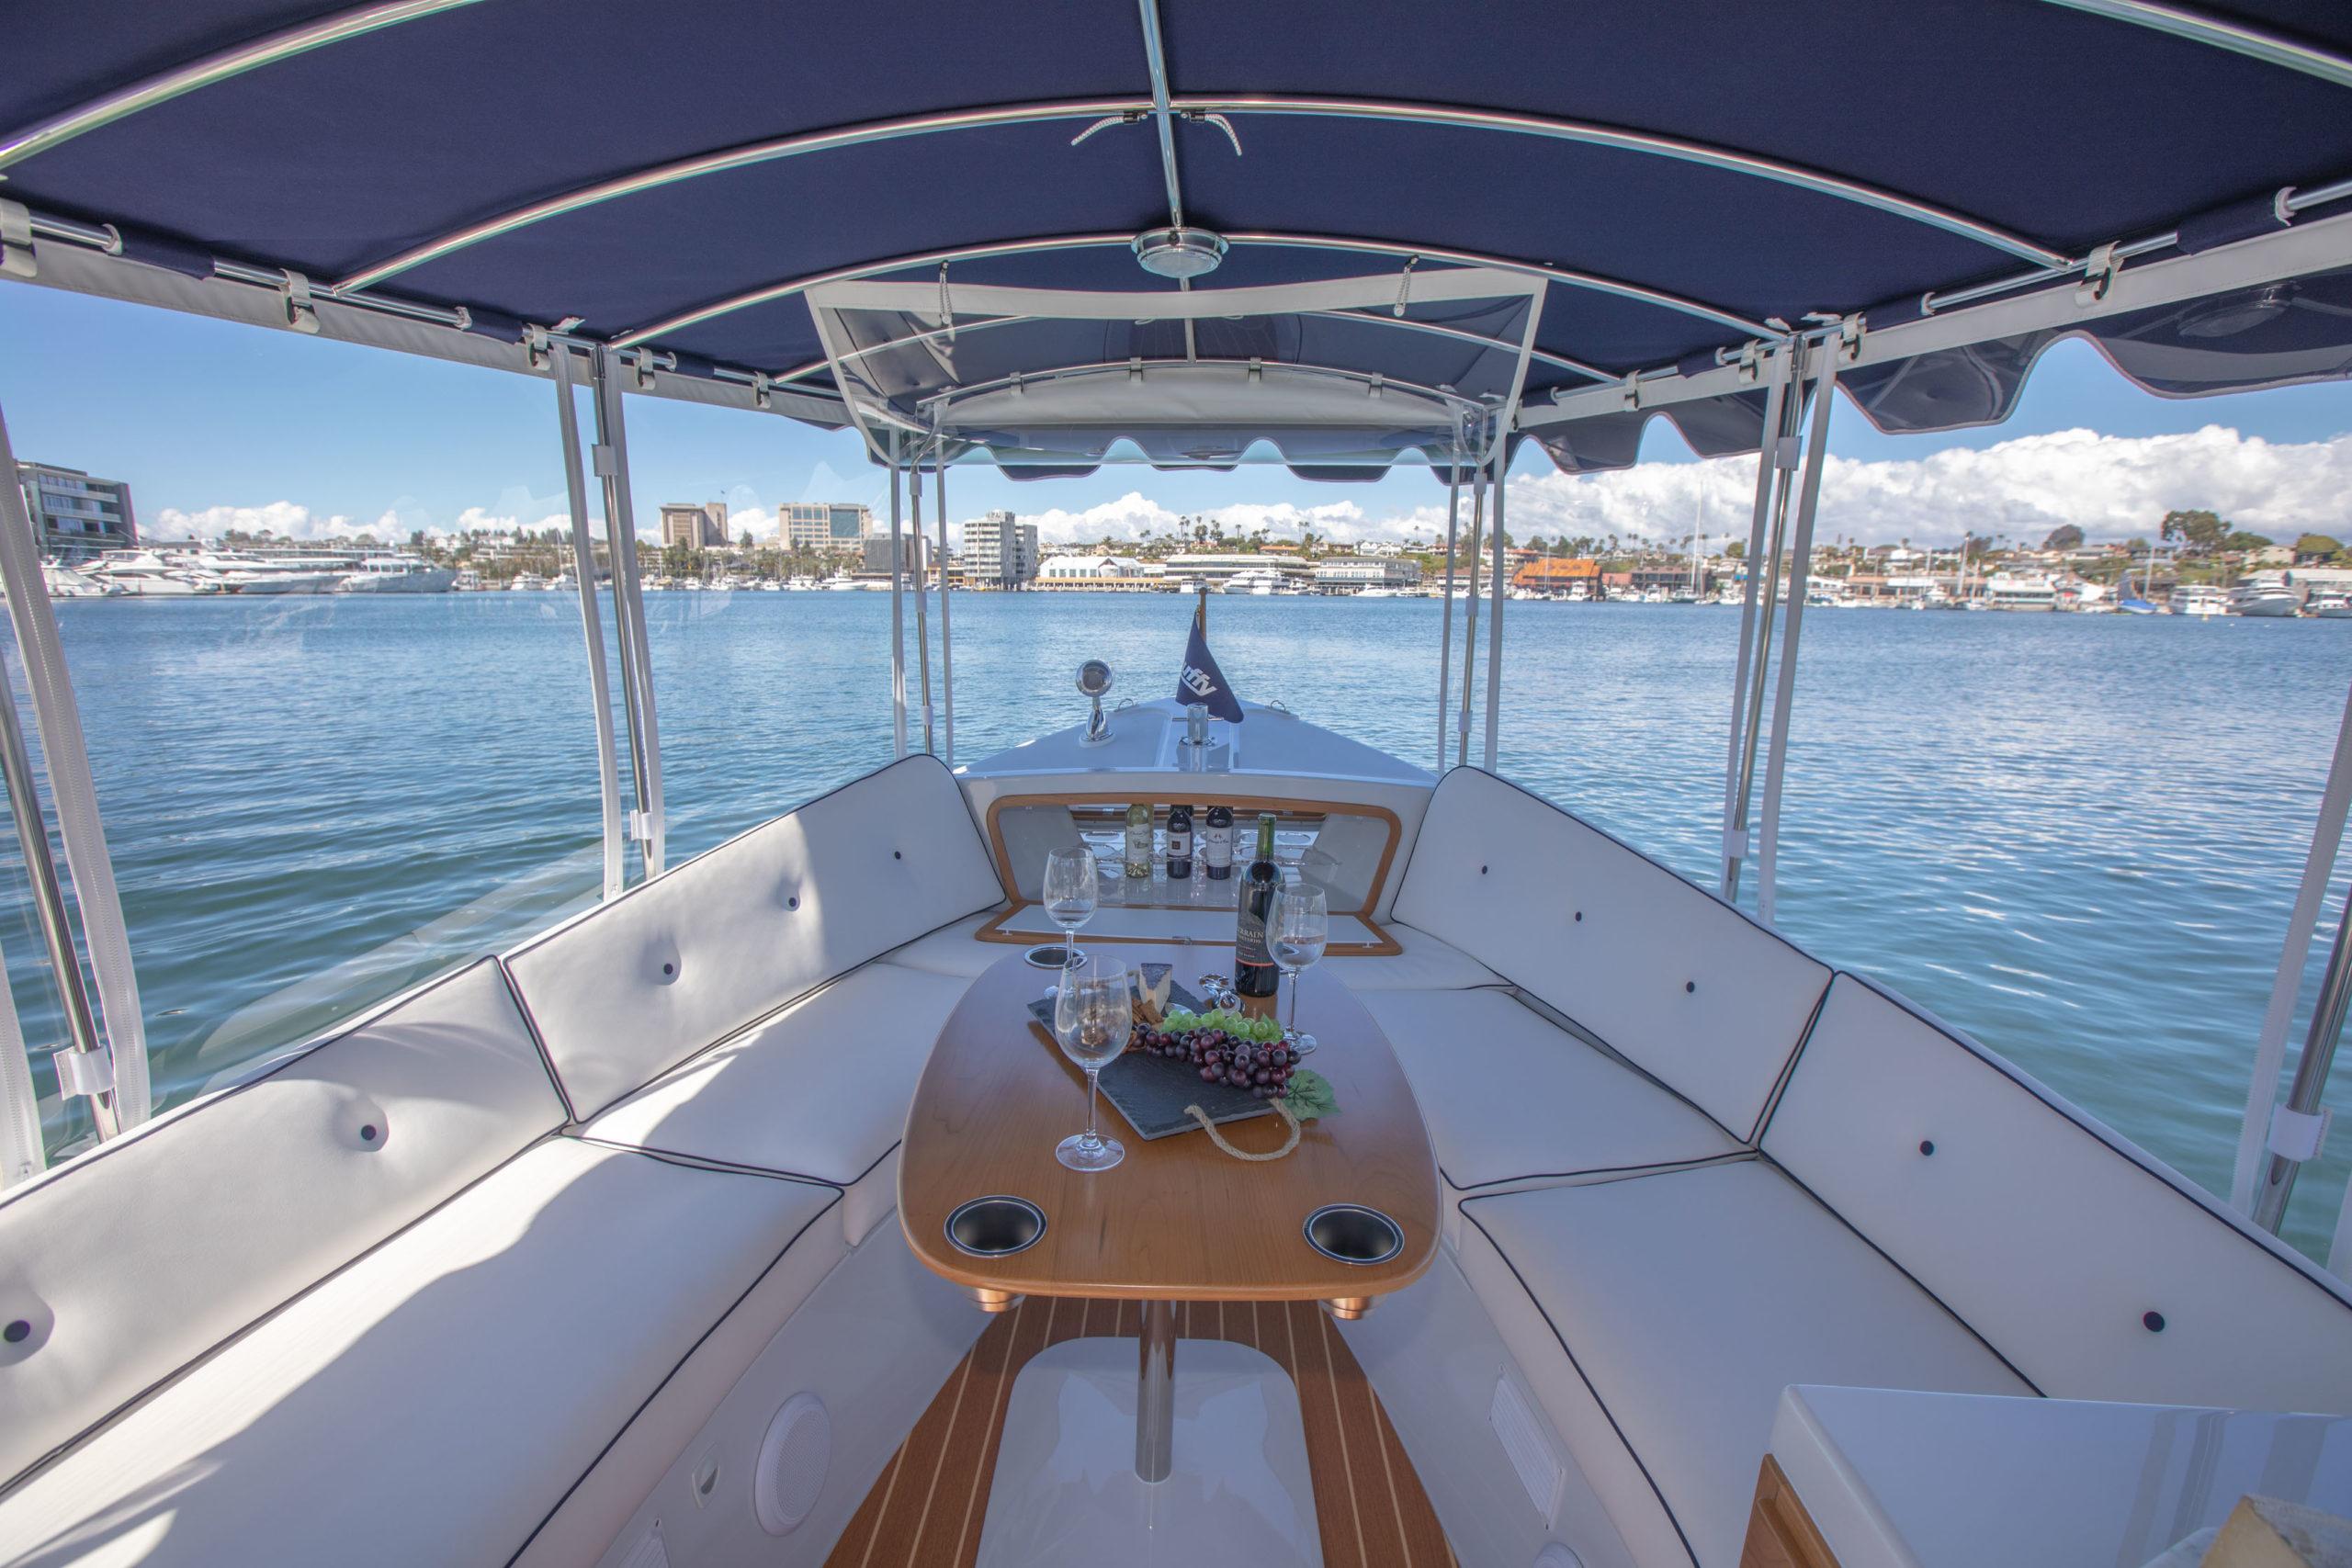 Photo of 2020 Duffy Electric Boat 22 Sun Cruiser forward interior.